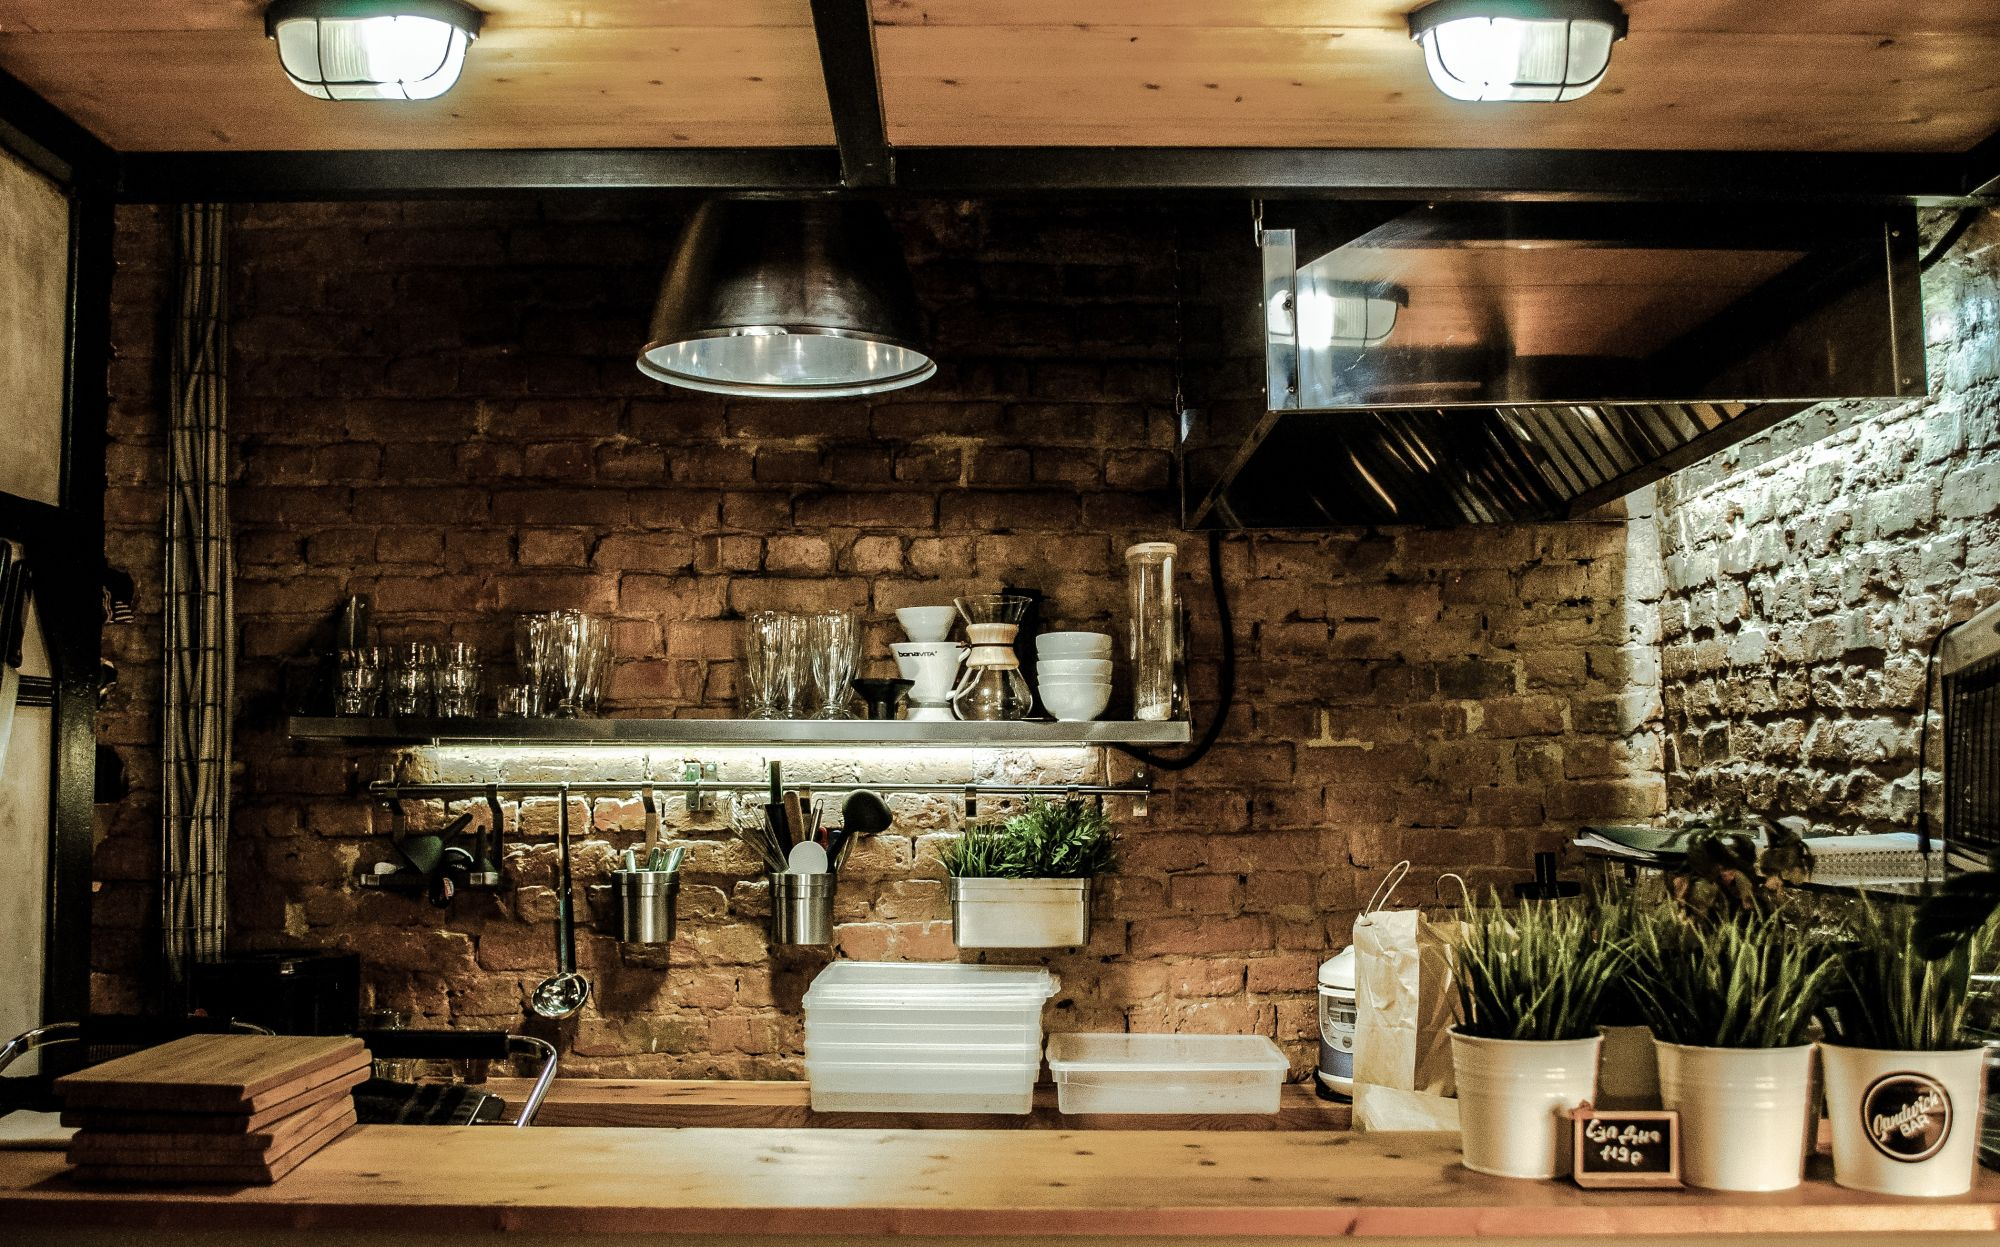 piante per la cucina